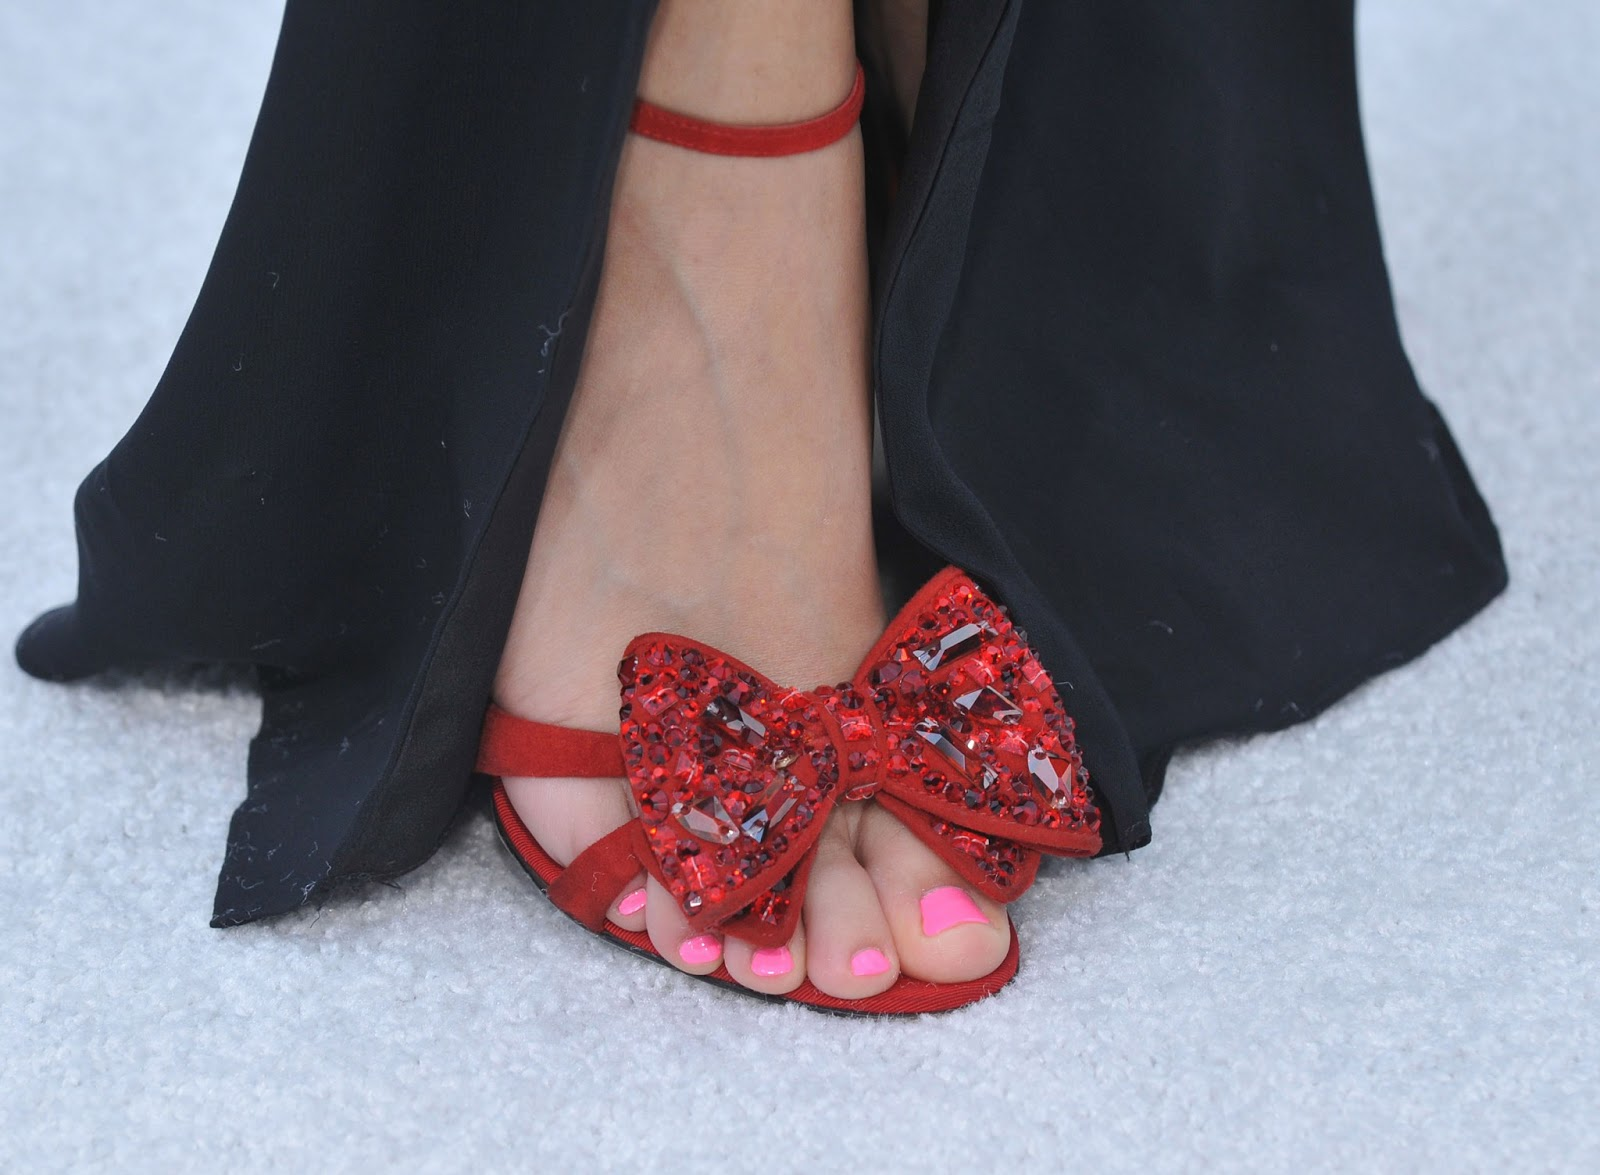 Selena Gomez Hd Feet Photos Sexy Feet Capture - Celebrity -2363